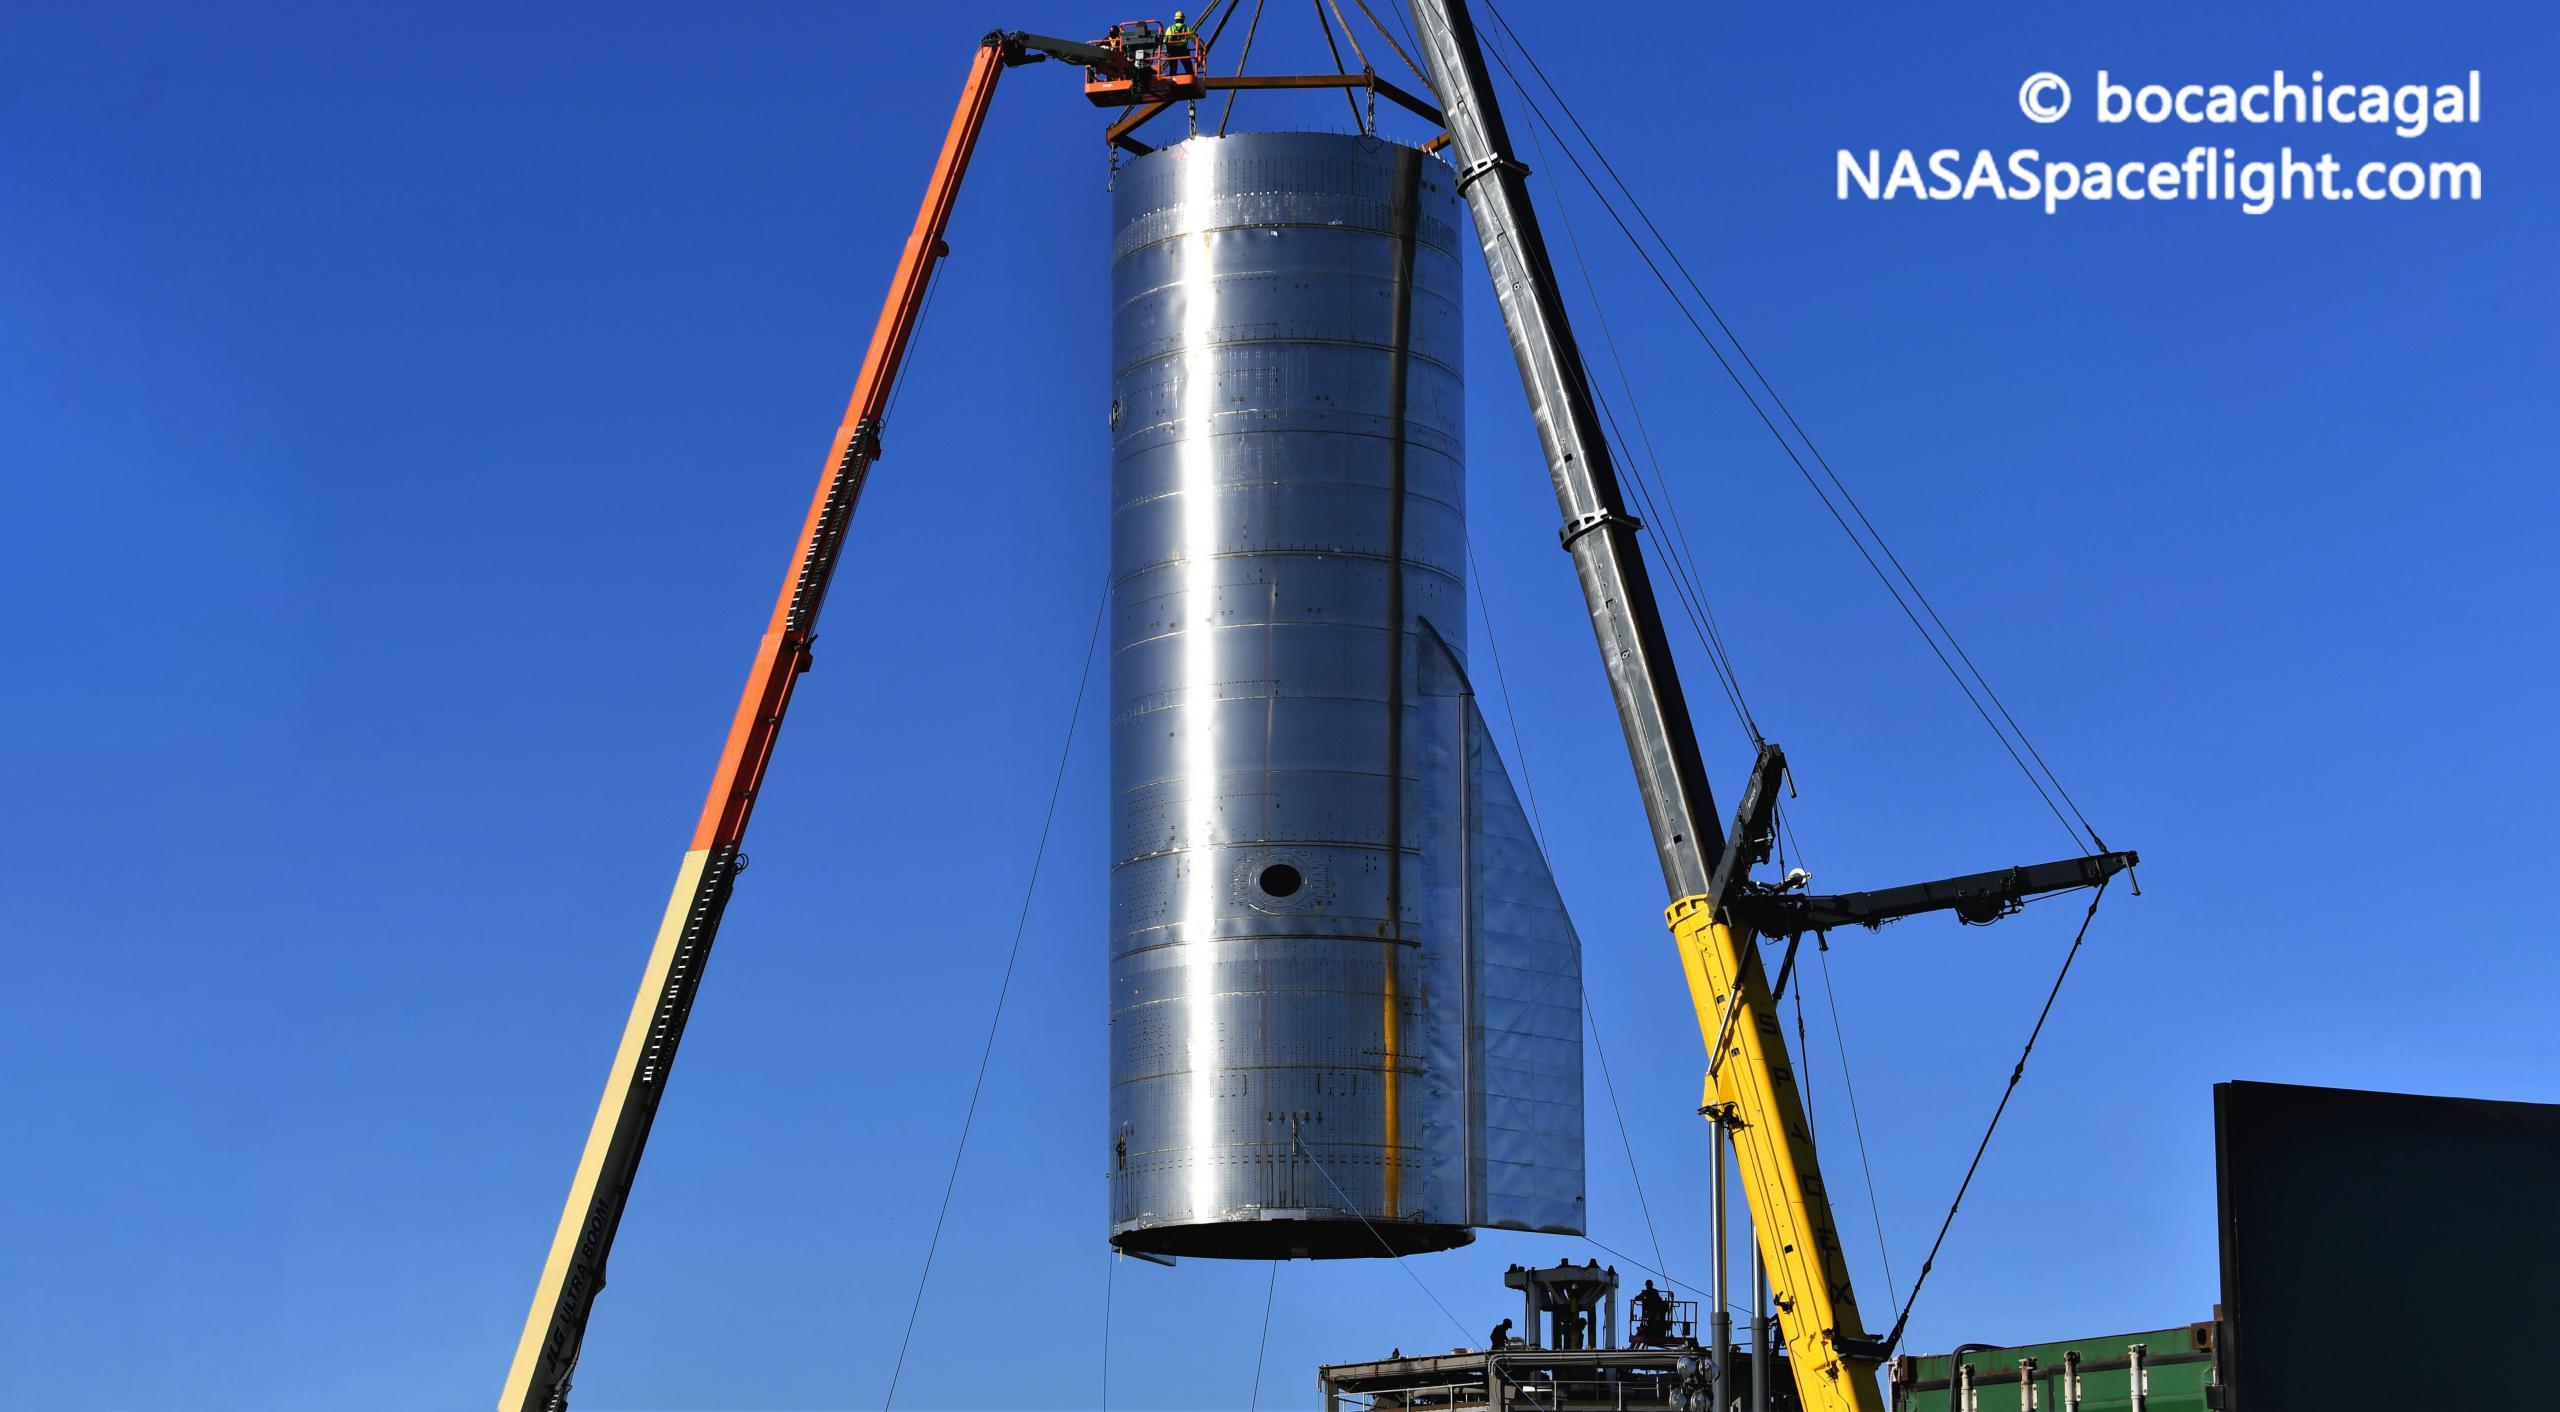 Starship Boca Chica 093020 (NASASpaceflight – bocachicagal) SN8 mount lift 10 edit (c)